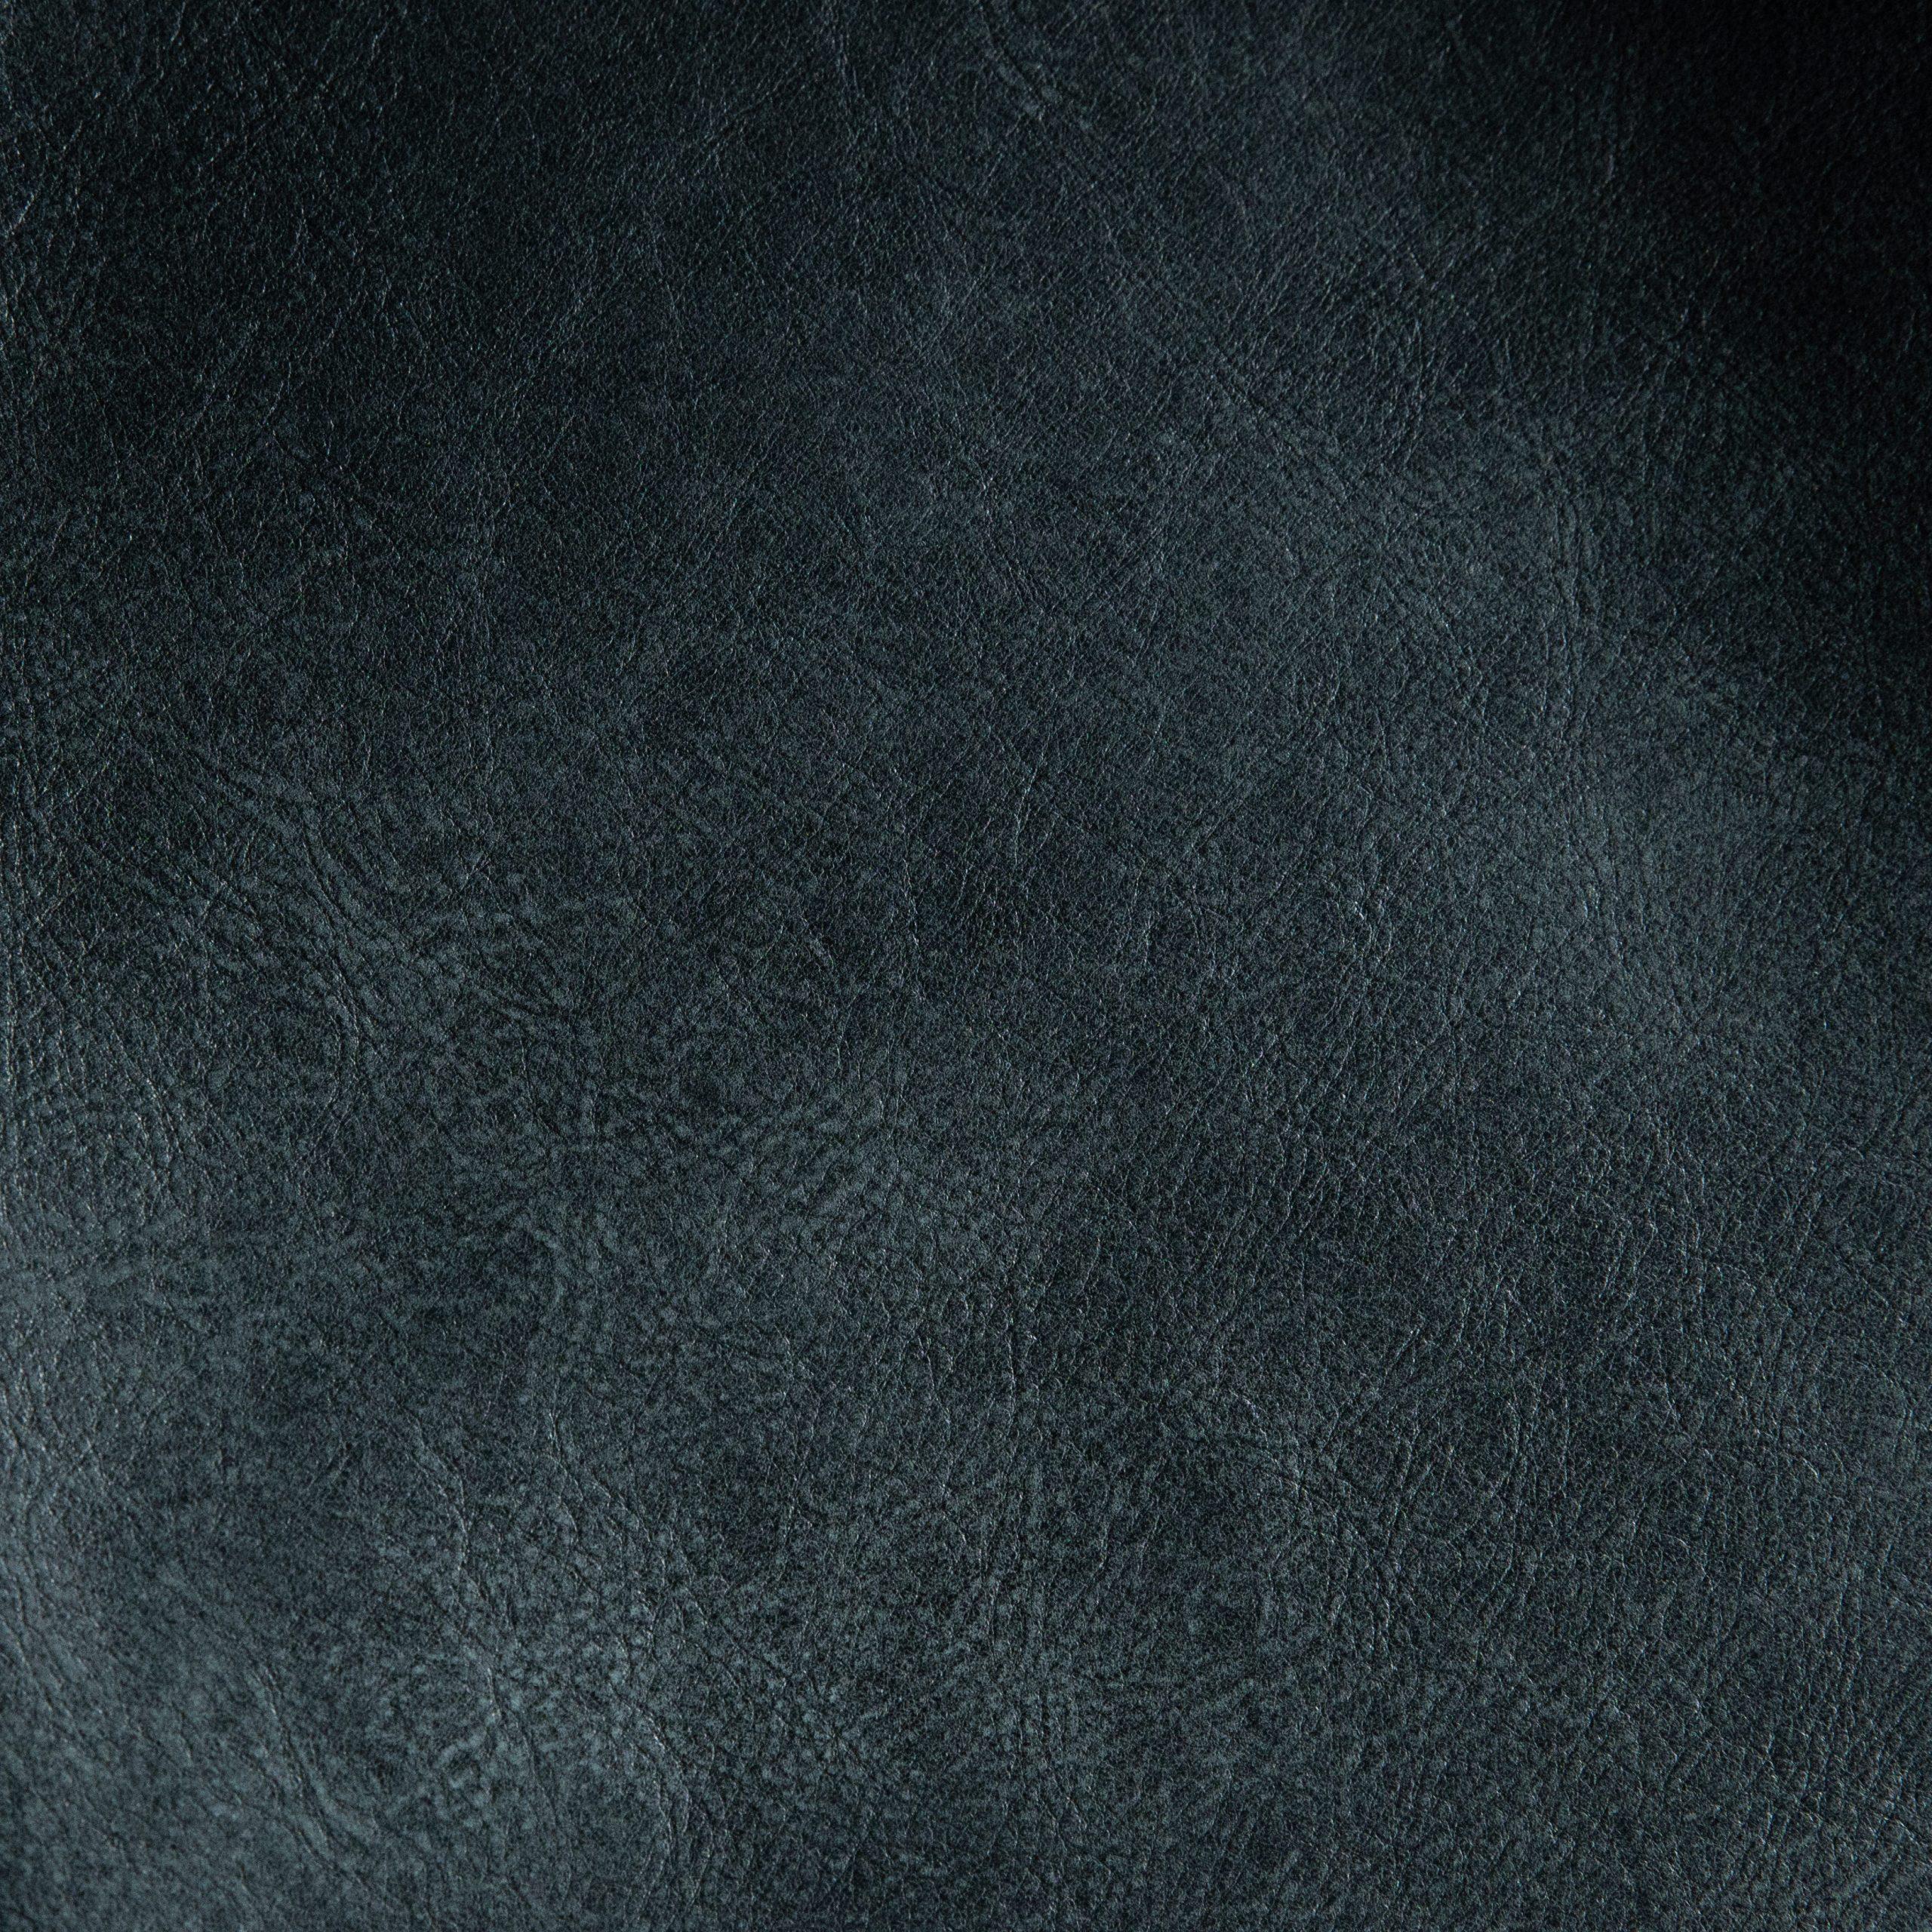 GRUNDE IV MIDNIGHT BLUE